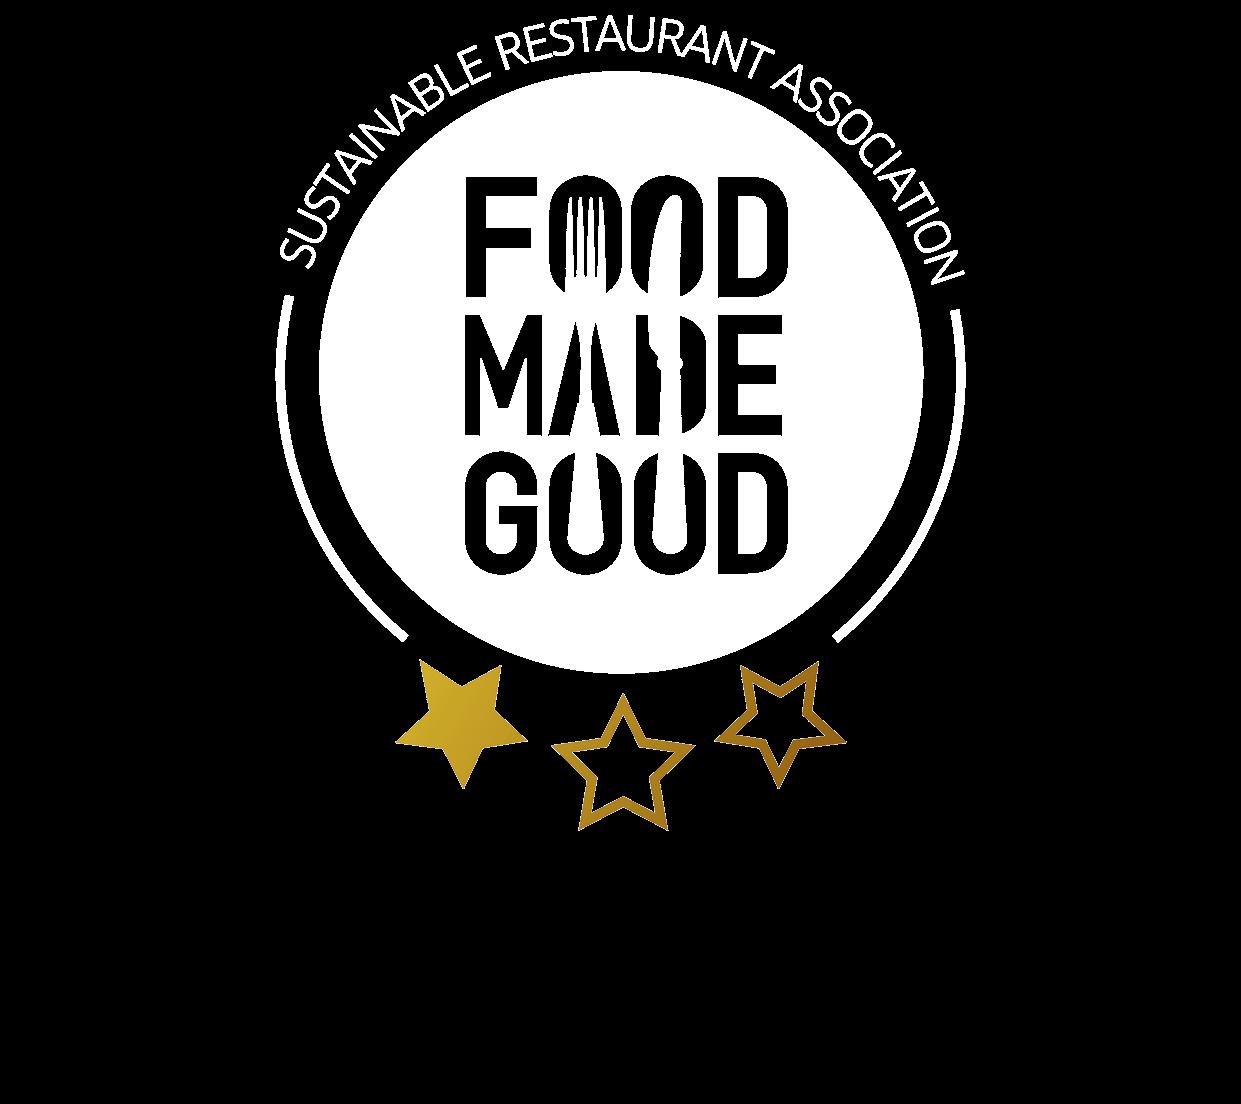 Sustainability Restaurant Association - Food Made Good - MARAY